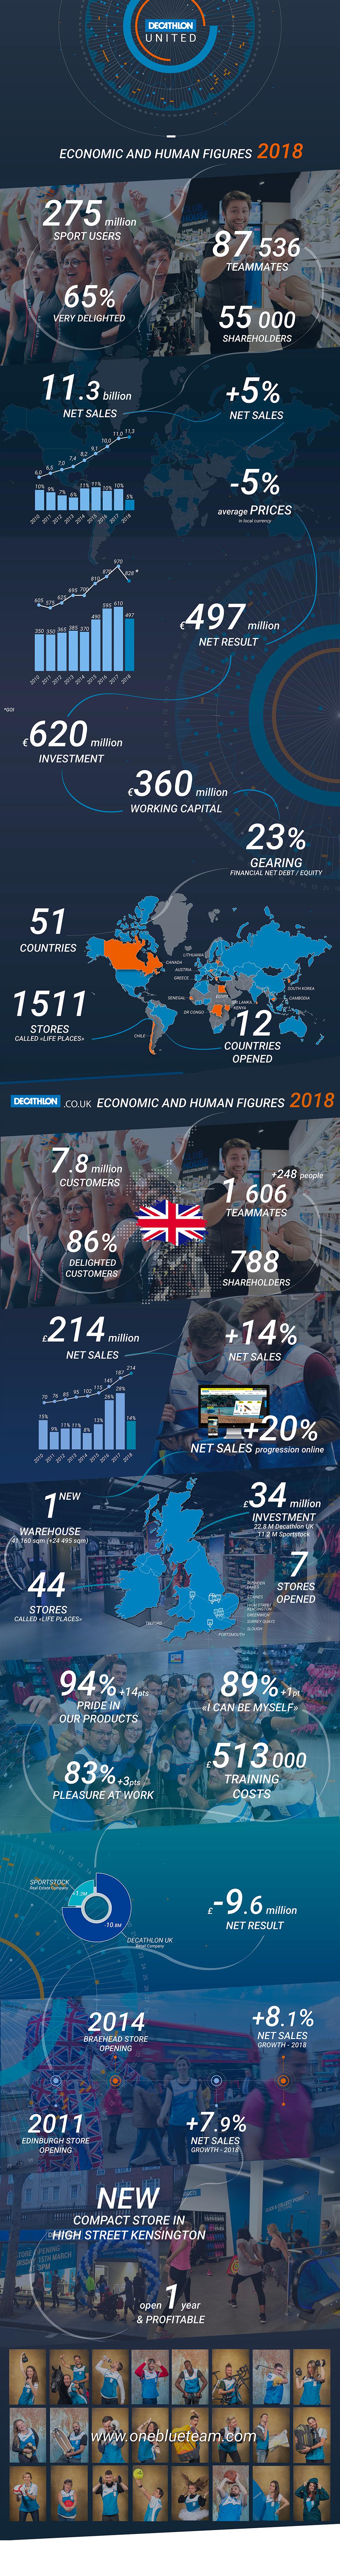 Economic and human figures 2018